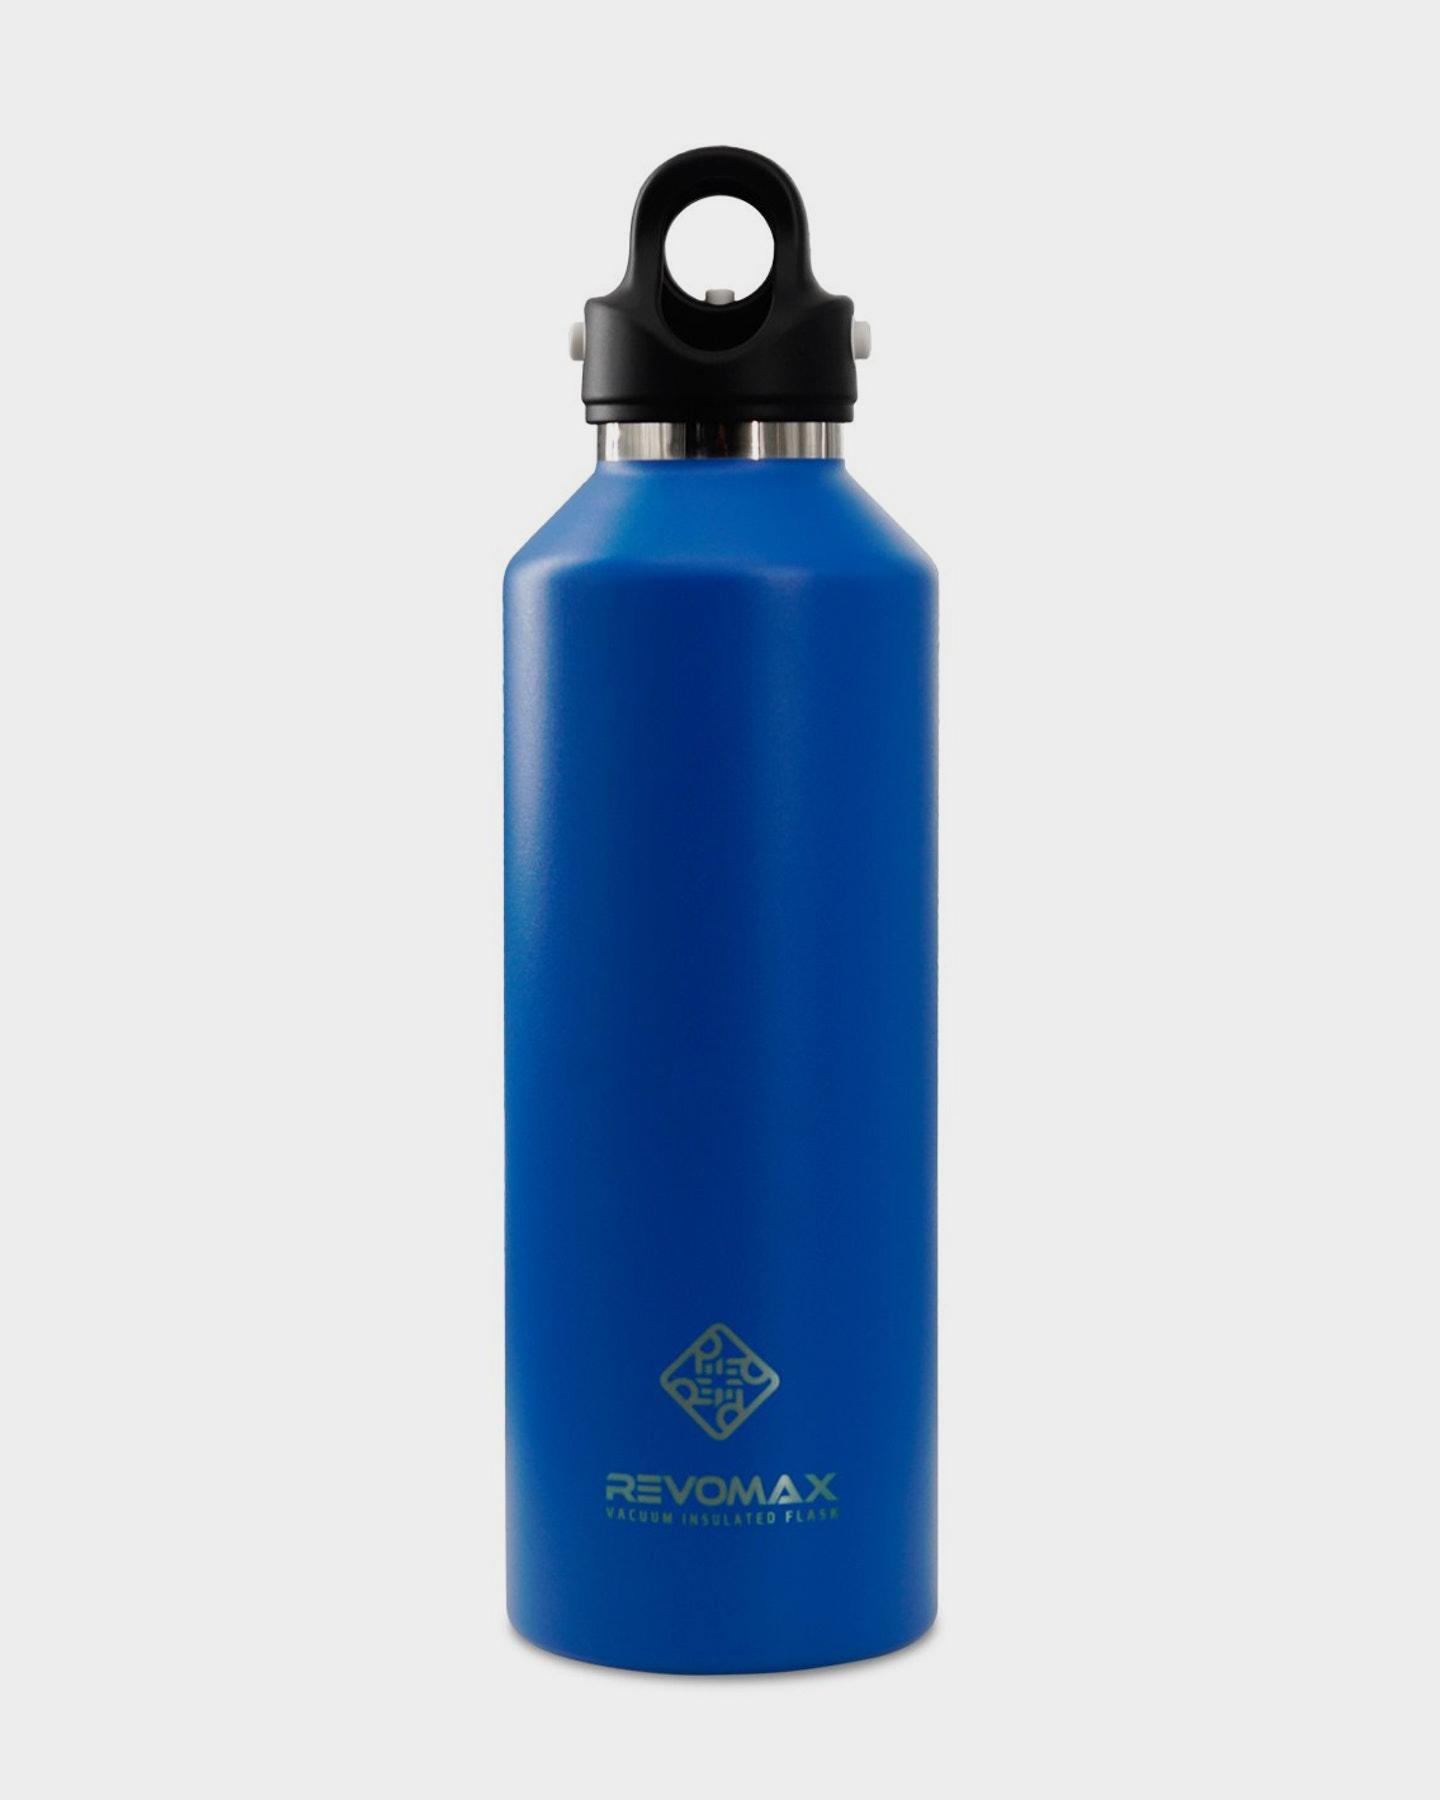 Revomax 950Ml - 32Oz Insulated Flask Drink Bottle Jewelry Blue